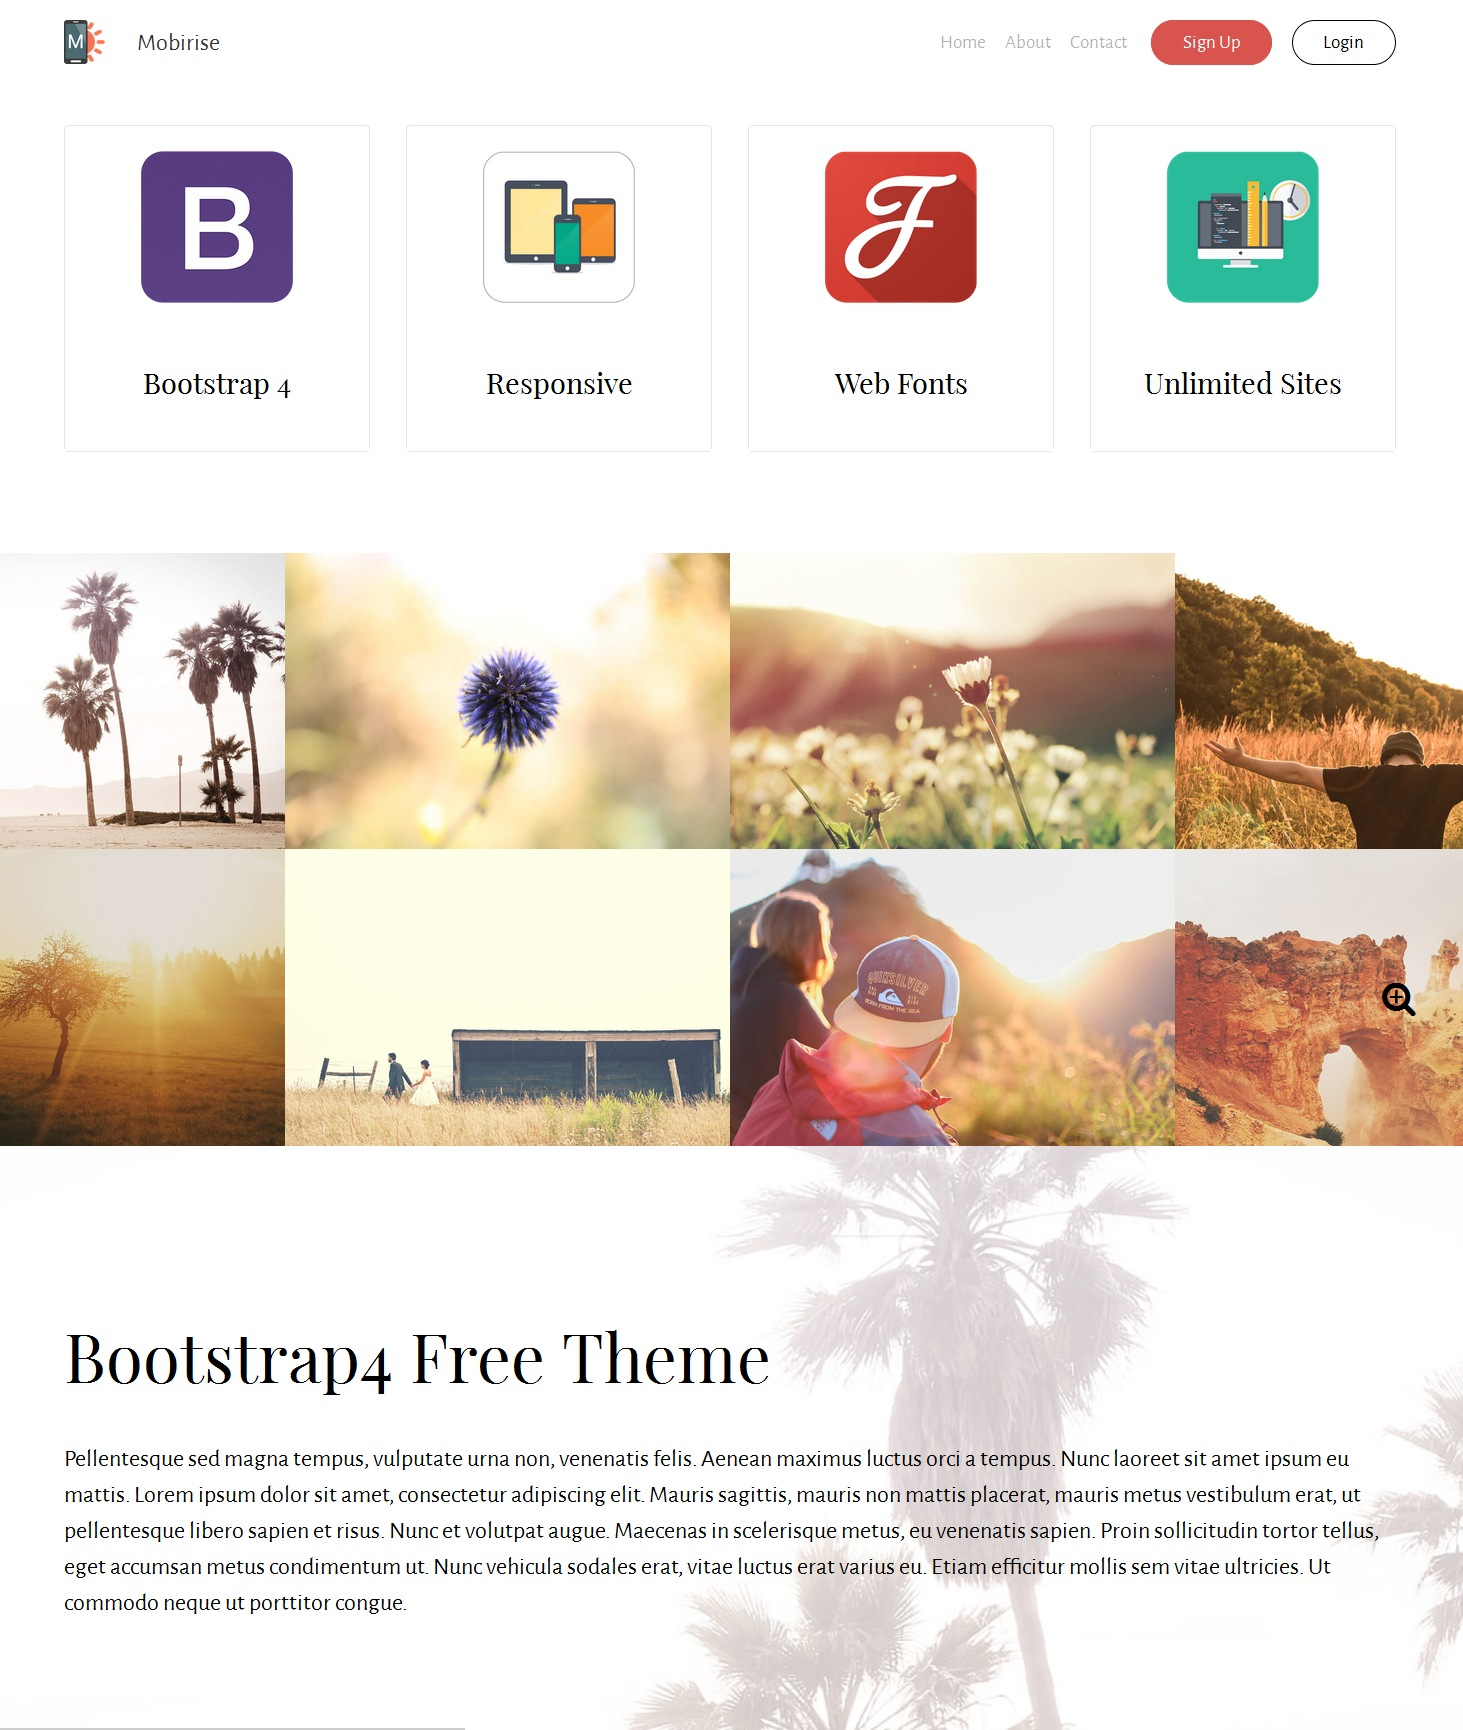 Mobile Bootstrap Education Theme